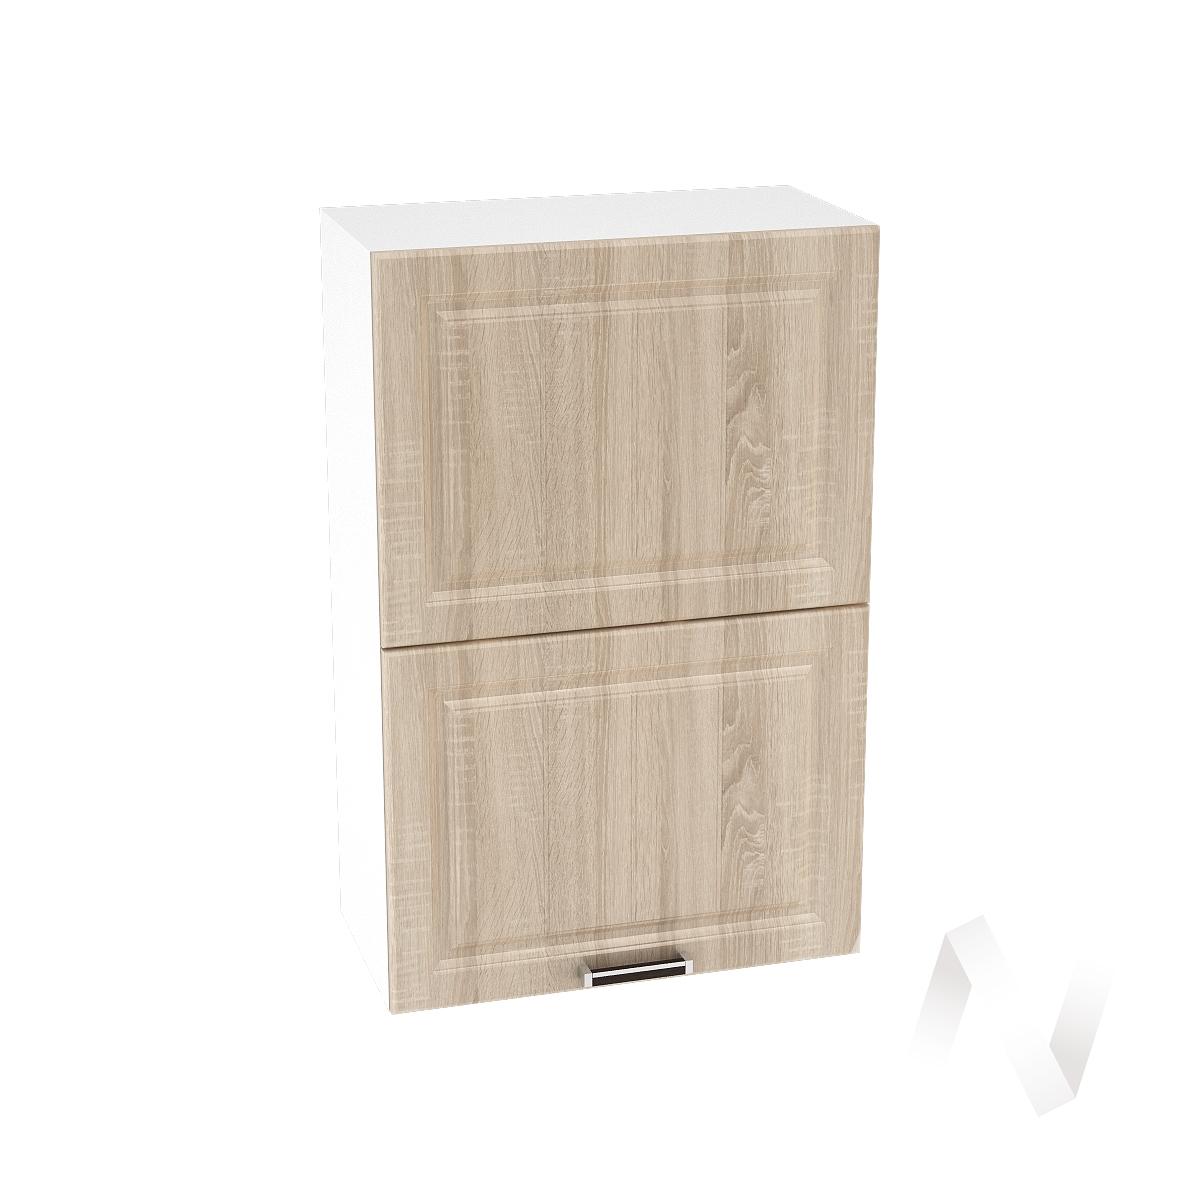 "Кухня ""Прага"": Шкаф верхний горизонтальный 602, ШВГ 602 (дуб сонома/корпус белый)"